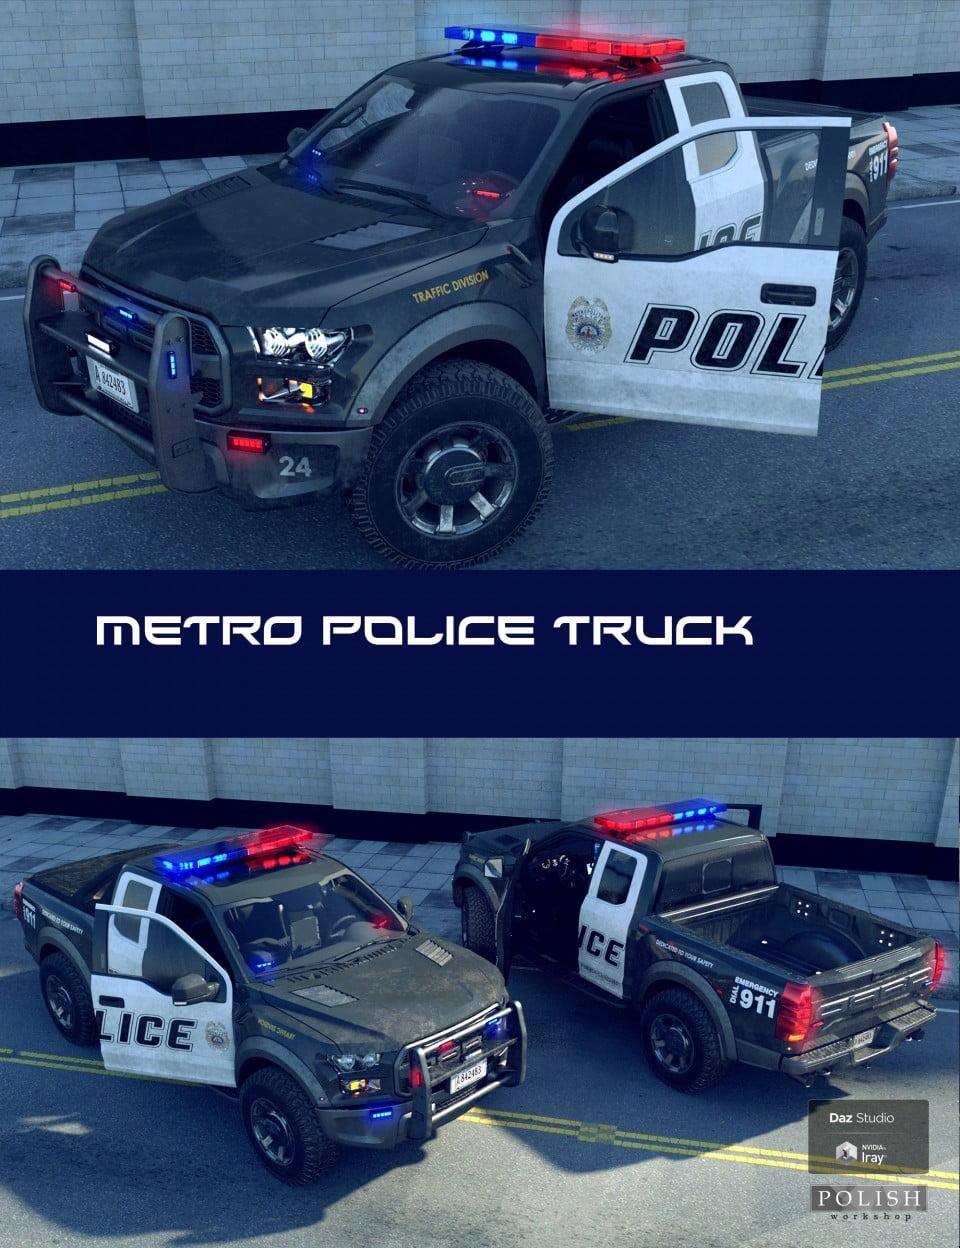 Metro Police Truck